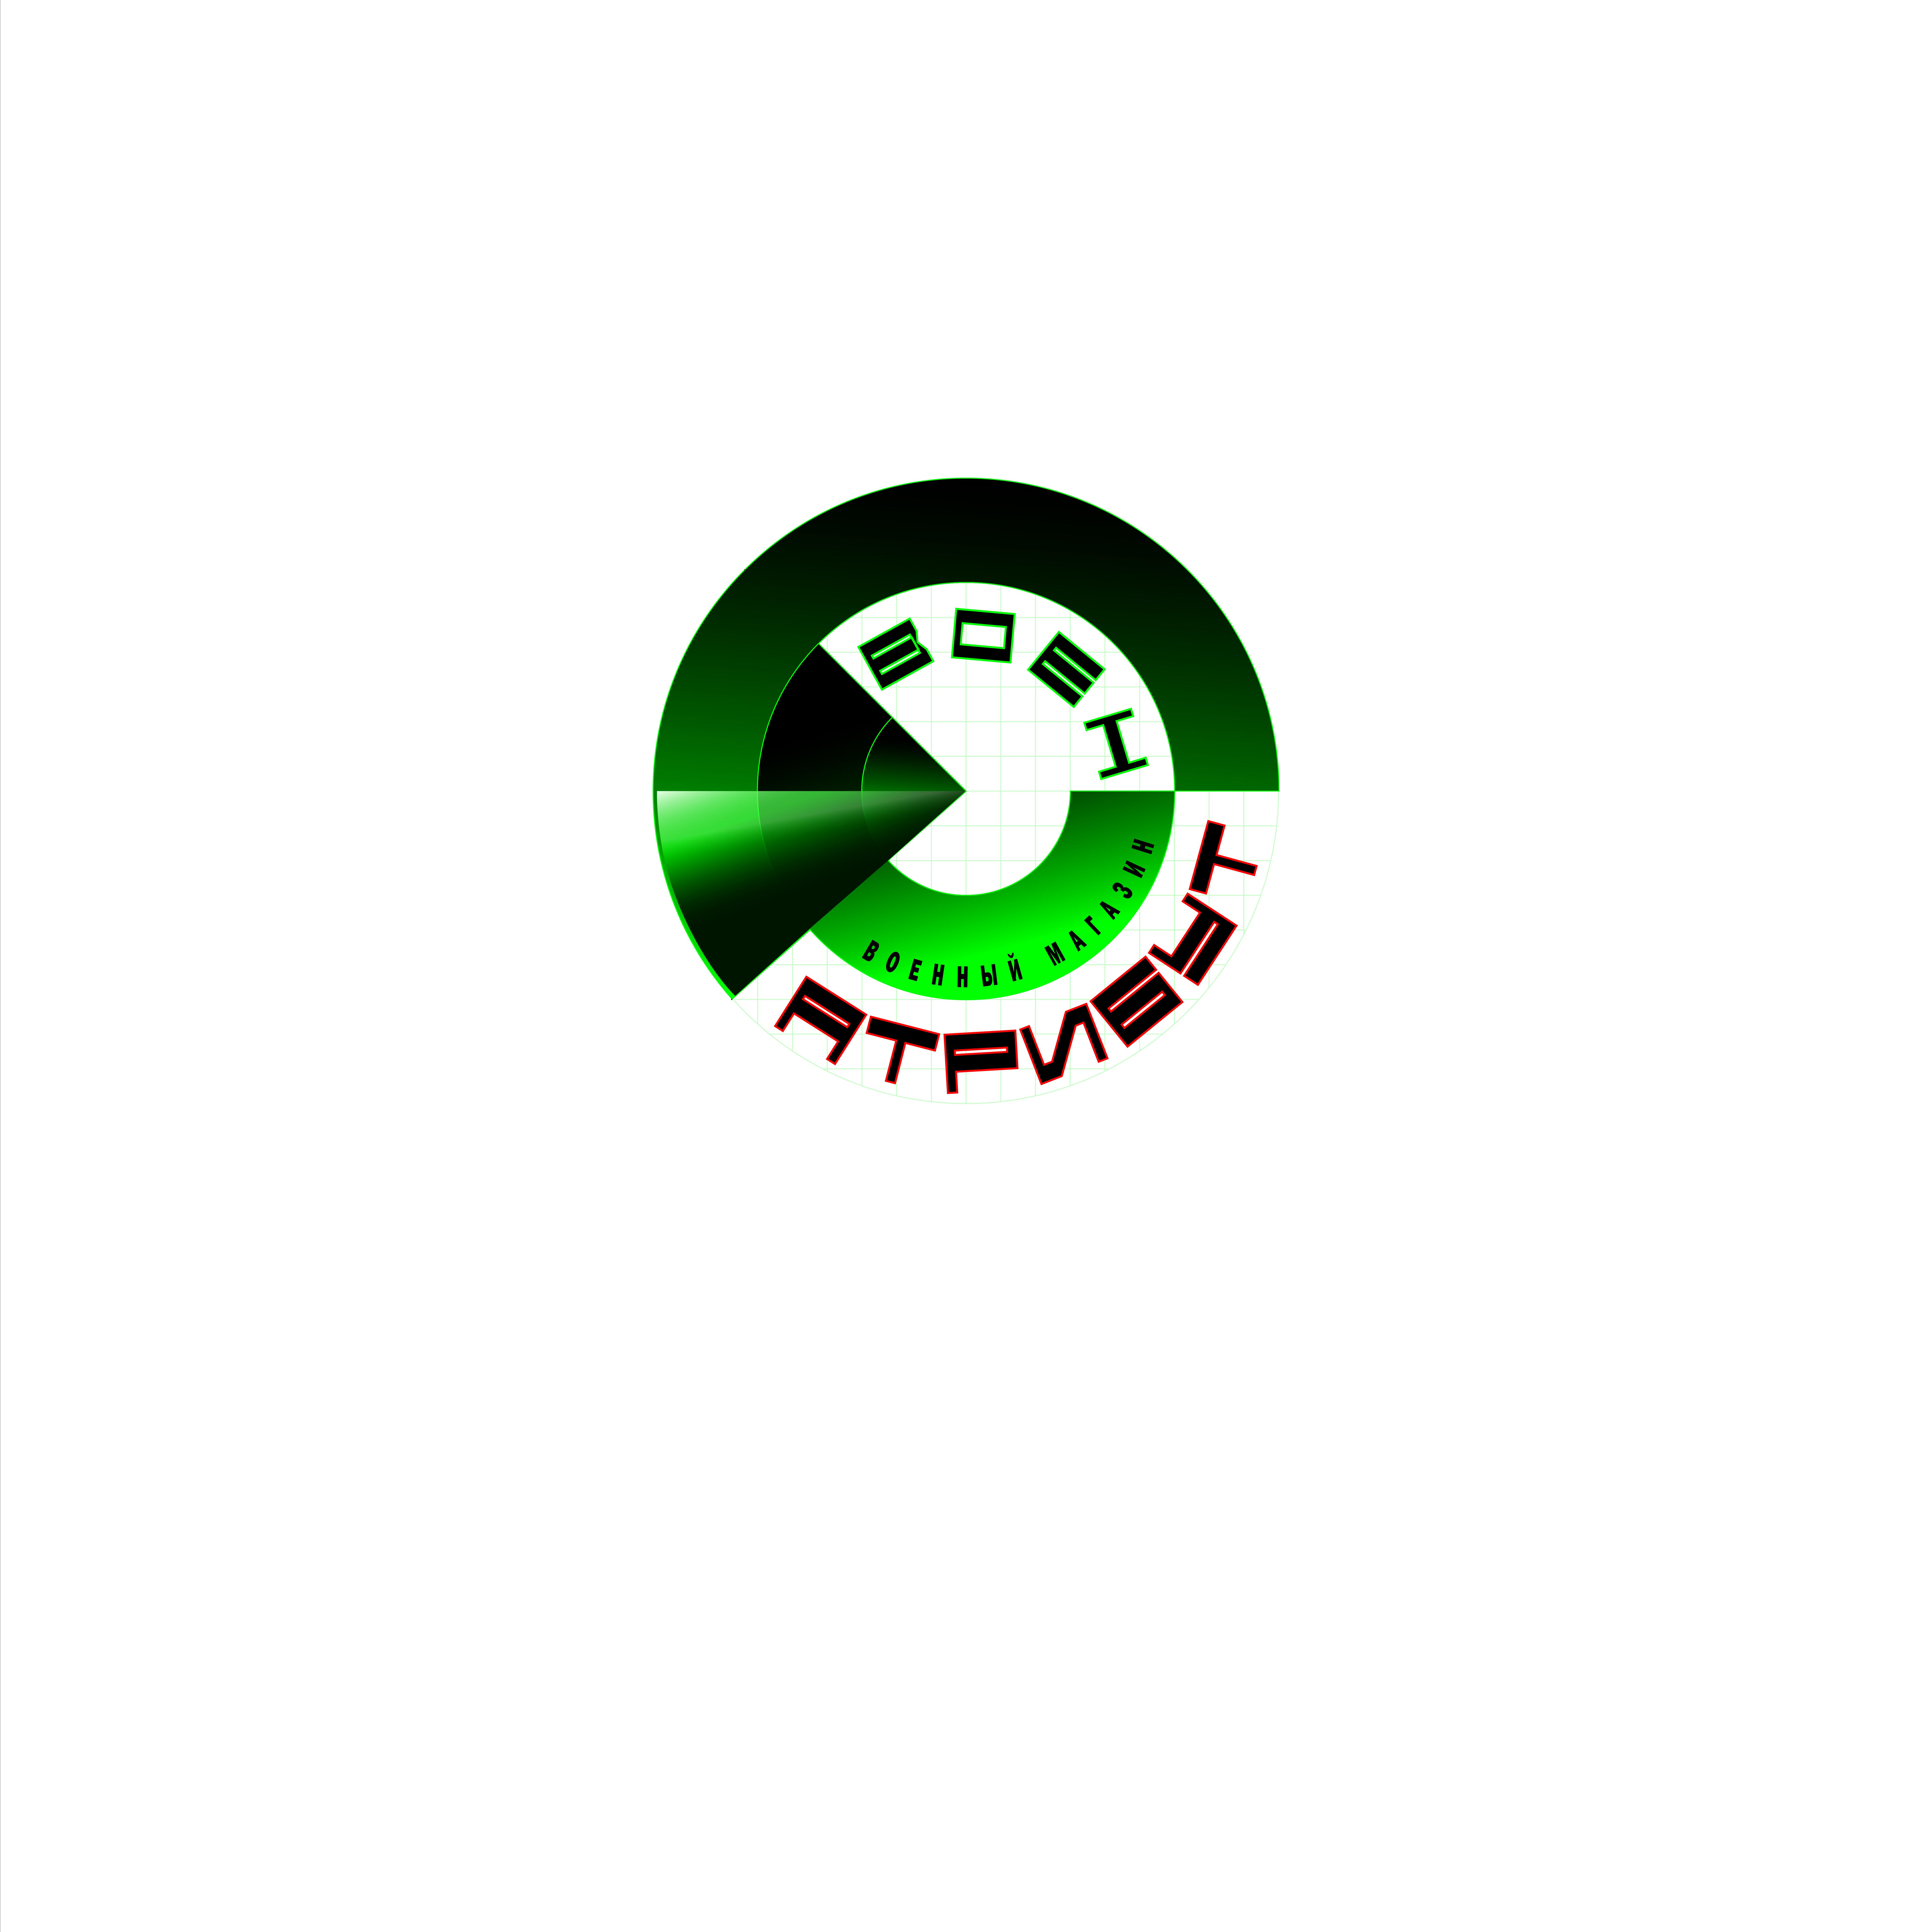 Разработка логотипа для компании военной тематики фото f_5816021aa23f28ba.png